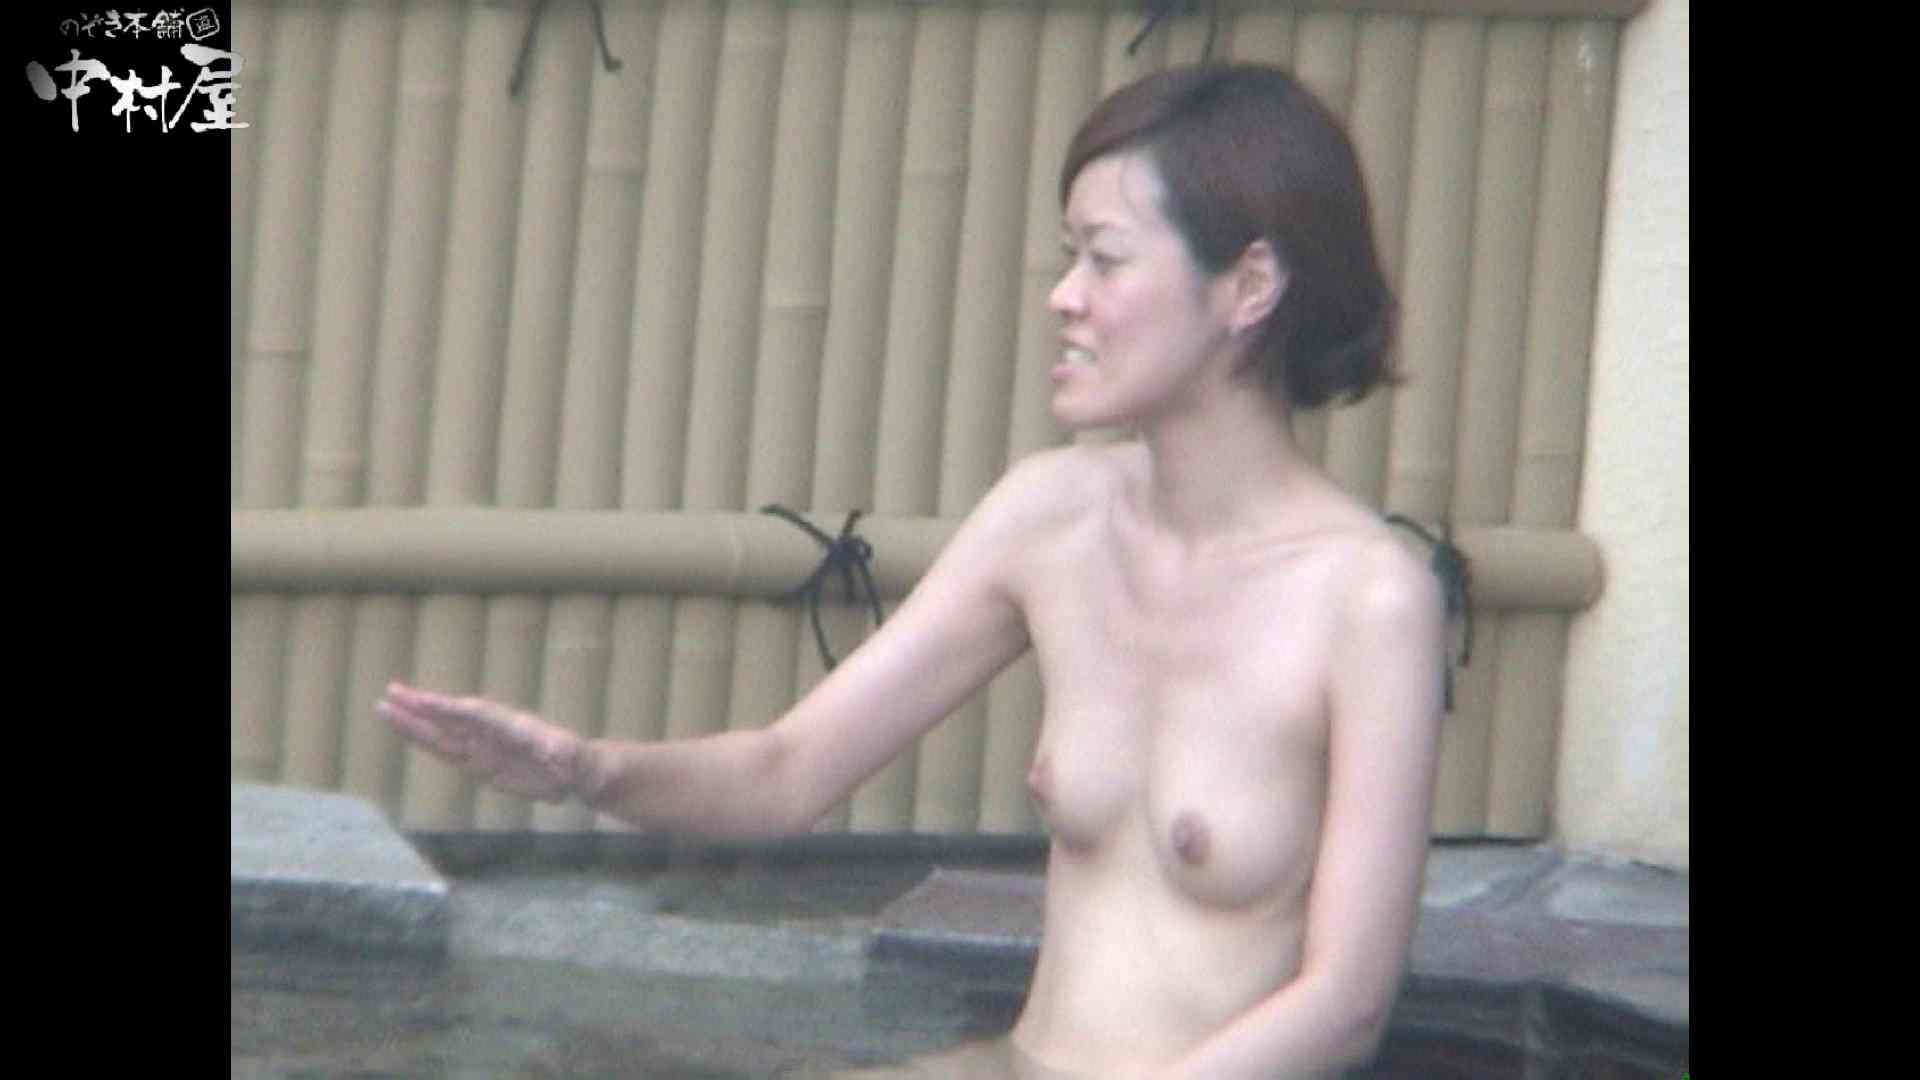 Aquaな露天風呂Vol.961 盗撮 のぞき動画画像 61枚 32